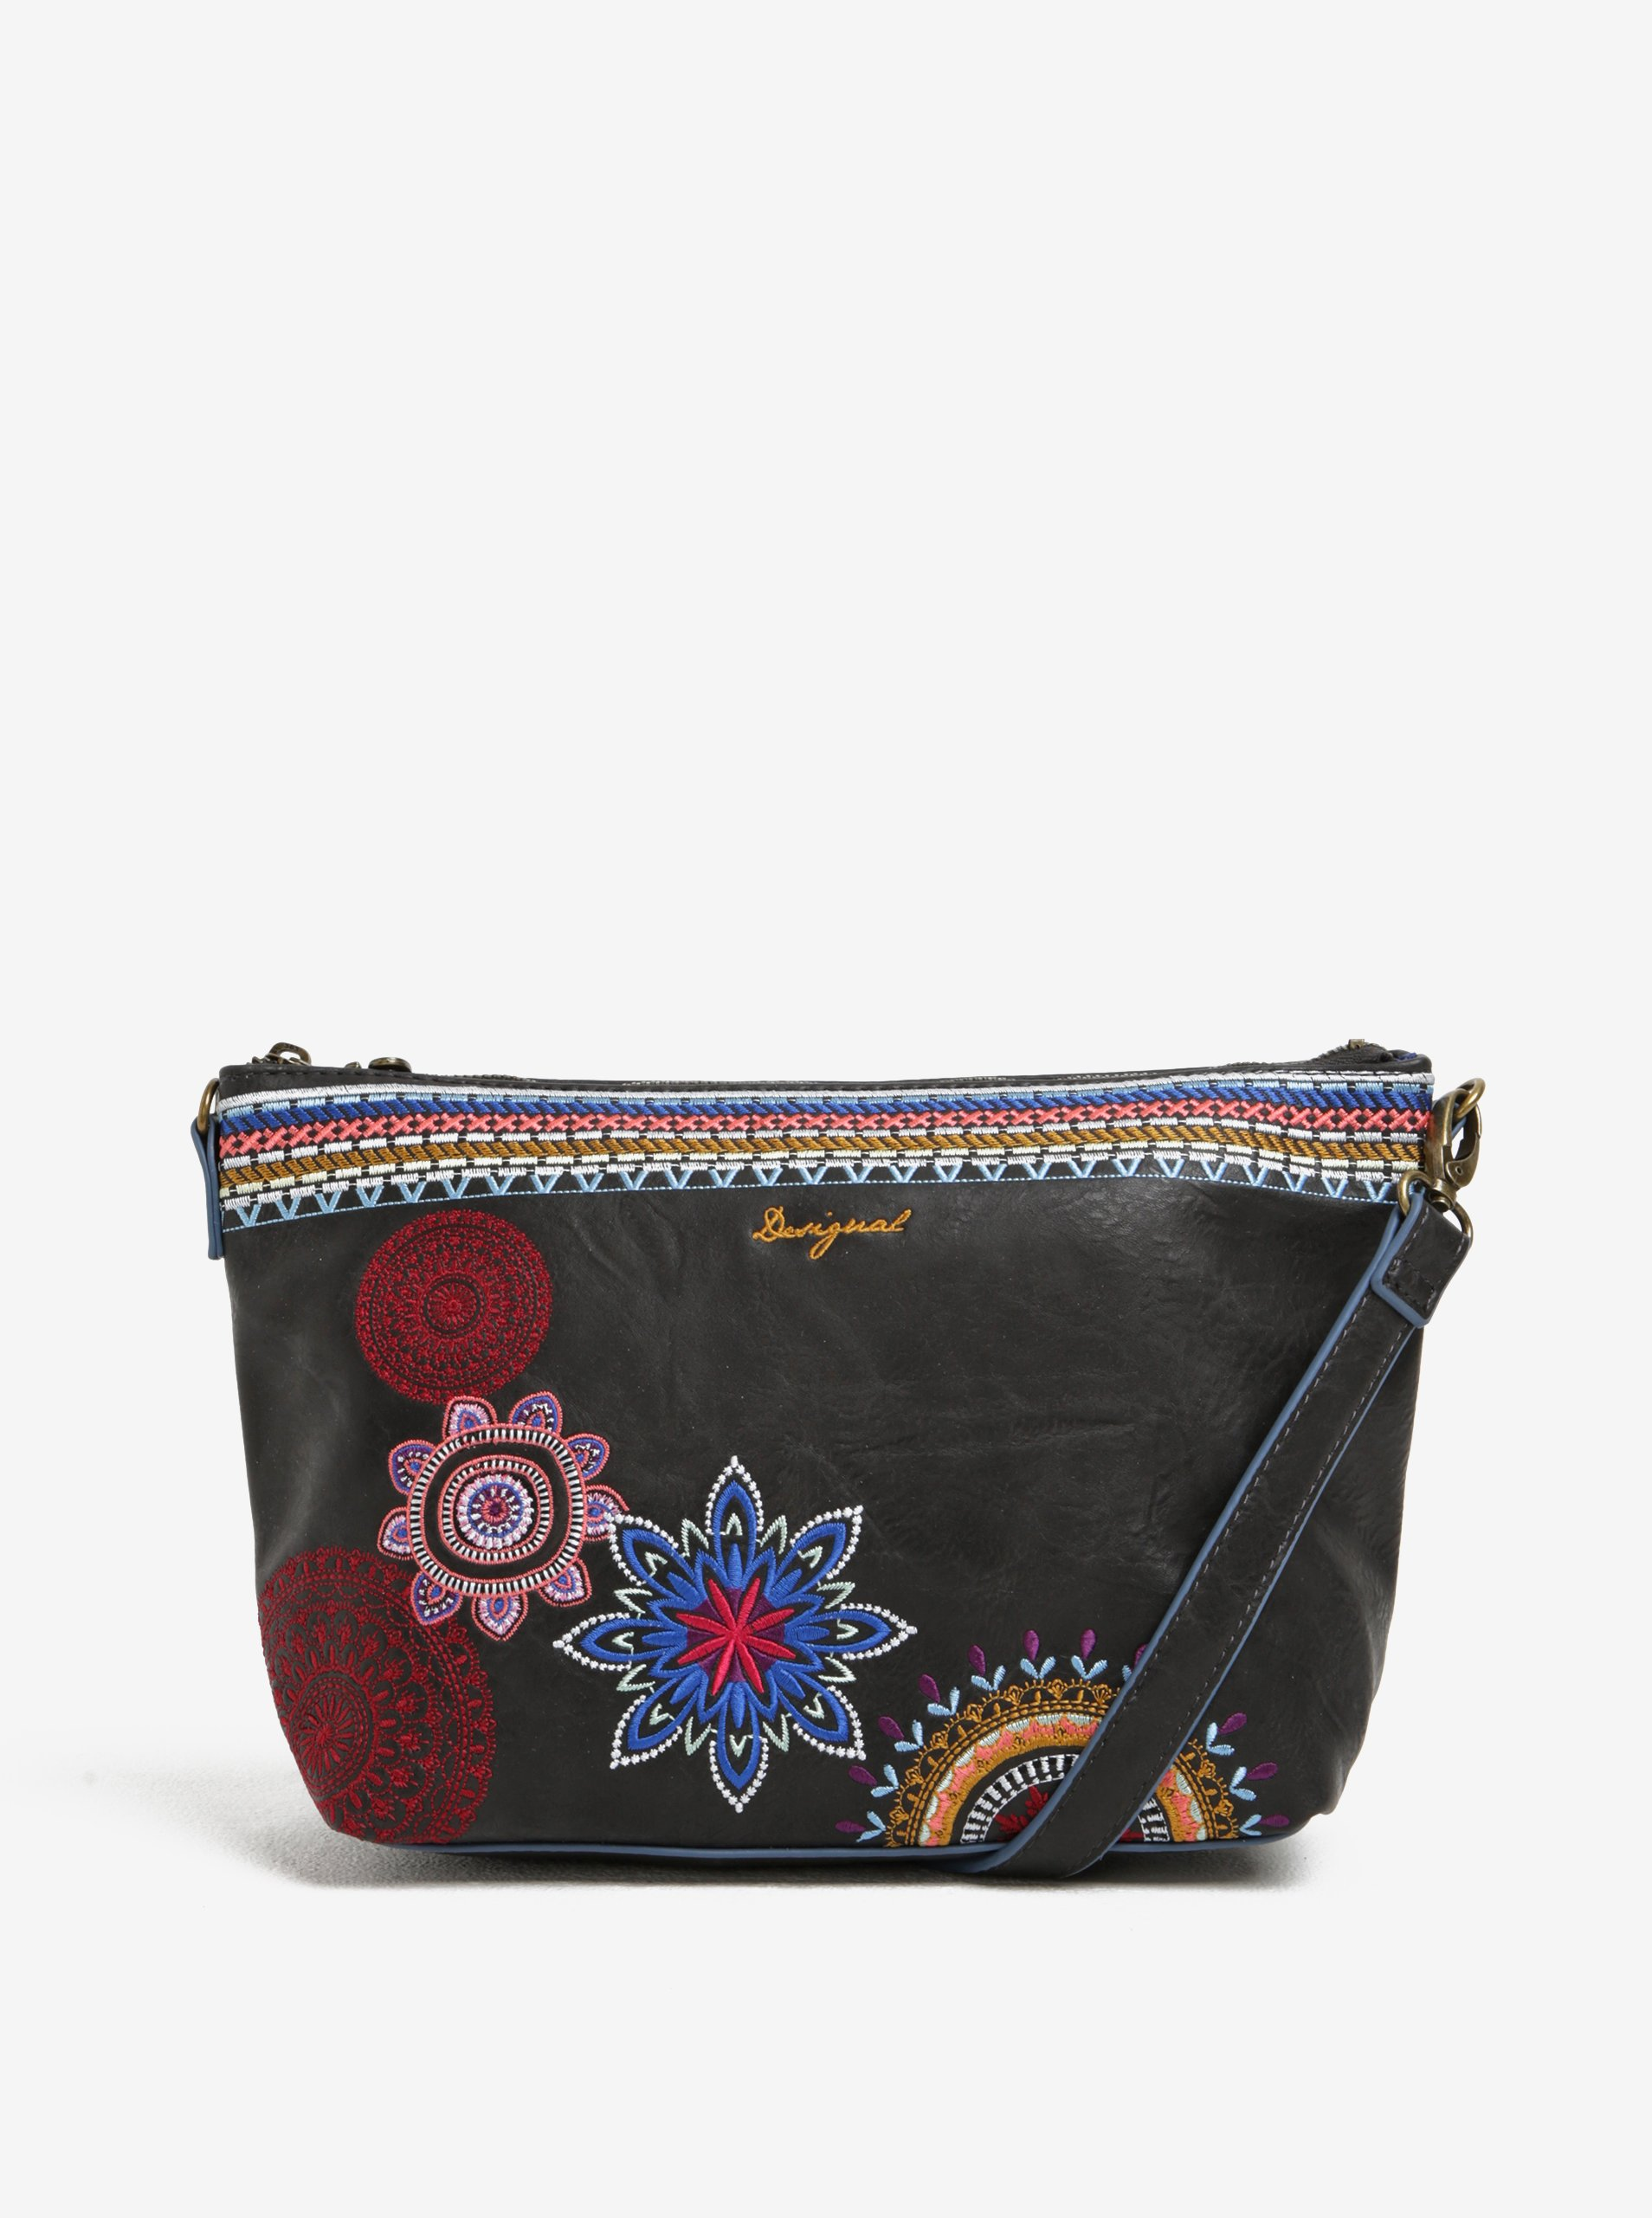 Černá kabelka s vyšívanými ornamenty Desigual Catania Amber